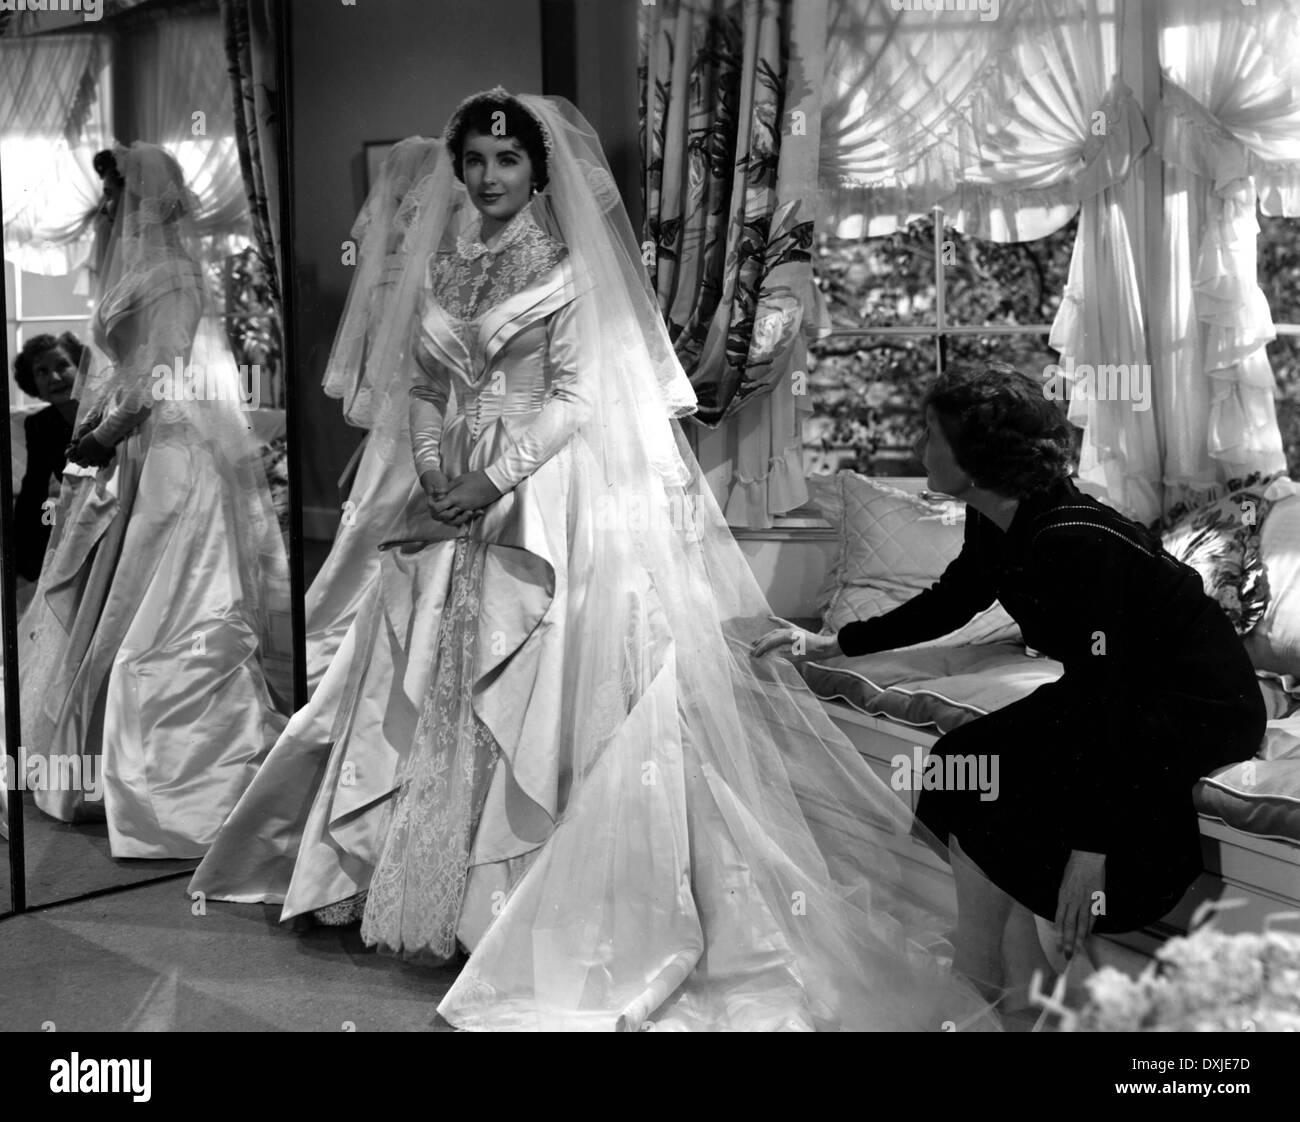 FATHER OF THE BRIDE (US1950) ELIZABETH TAYLOR WEDDING DRESS